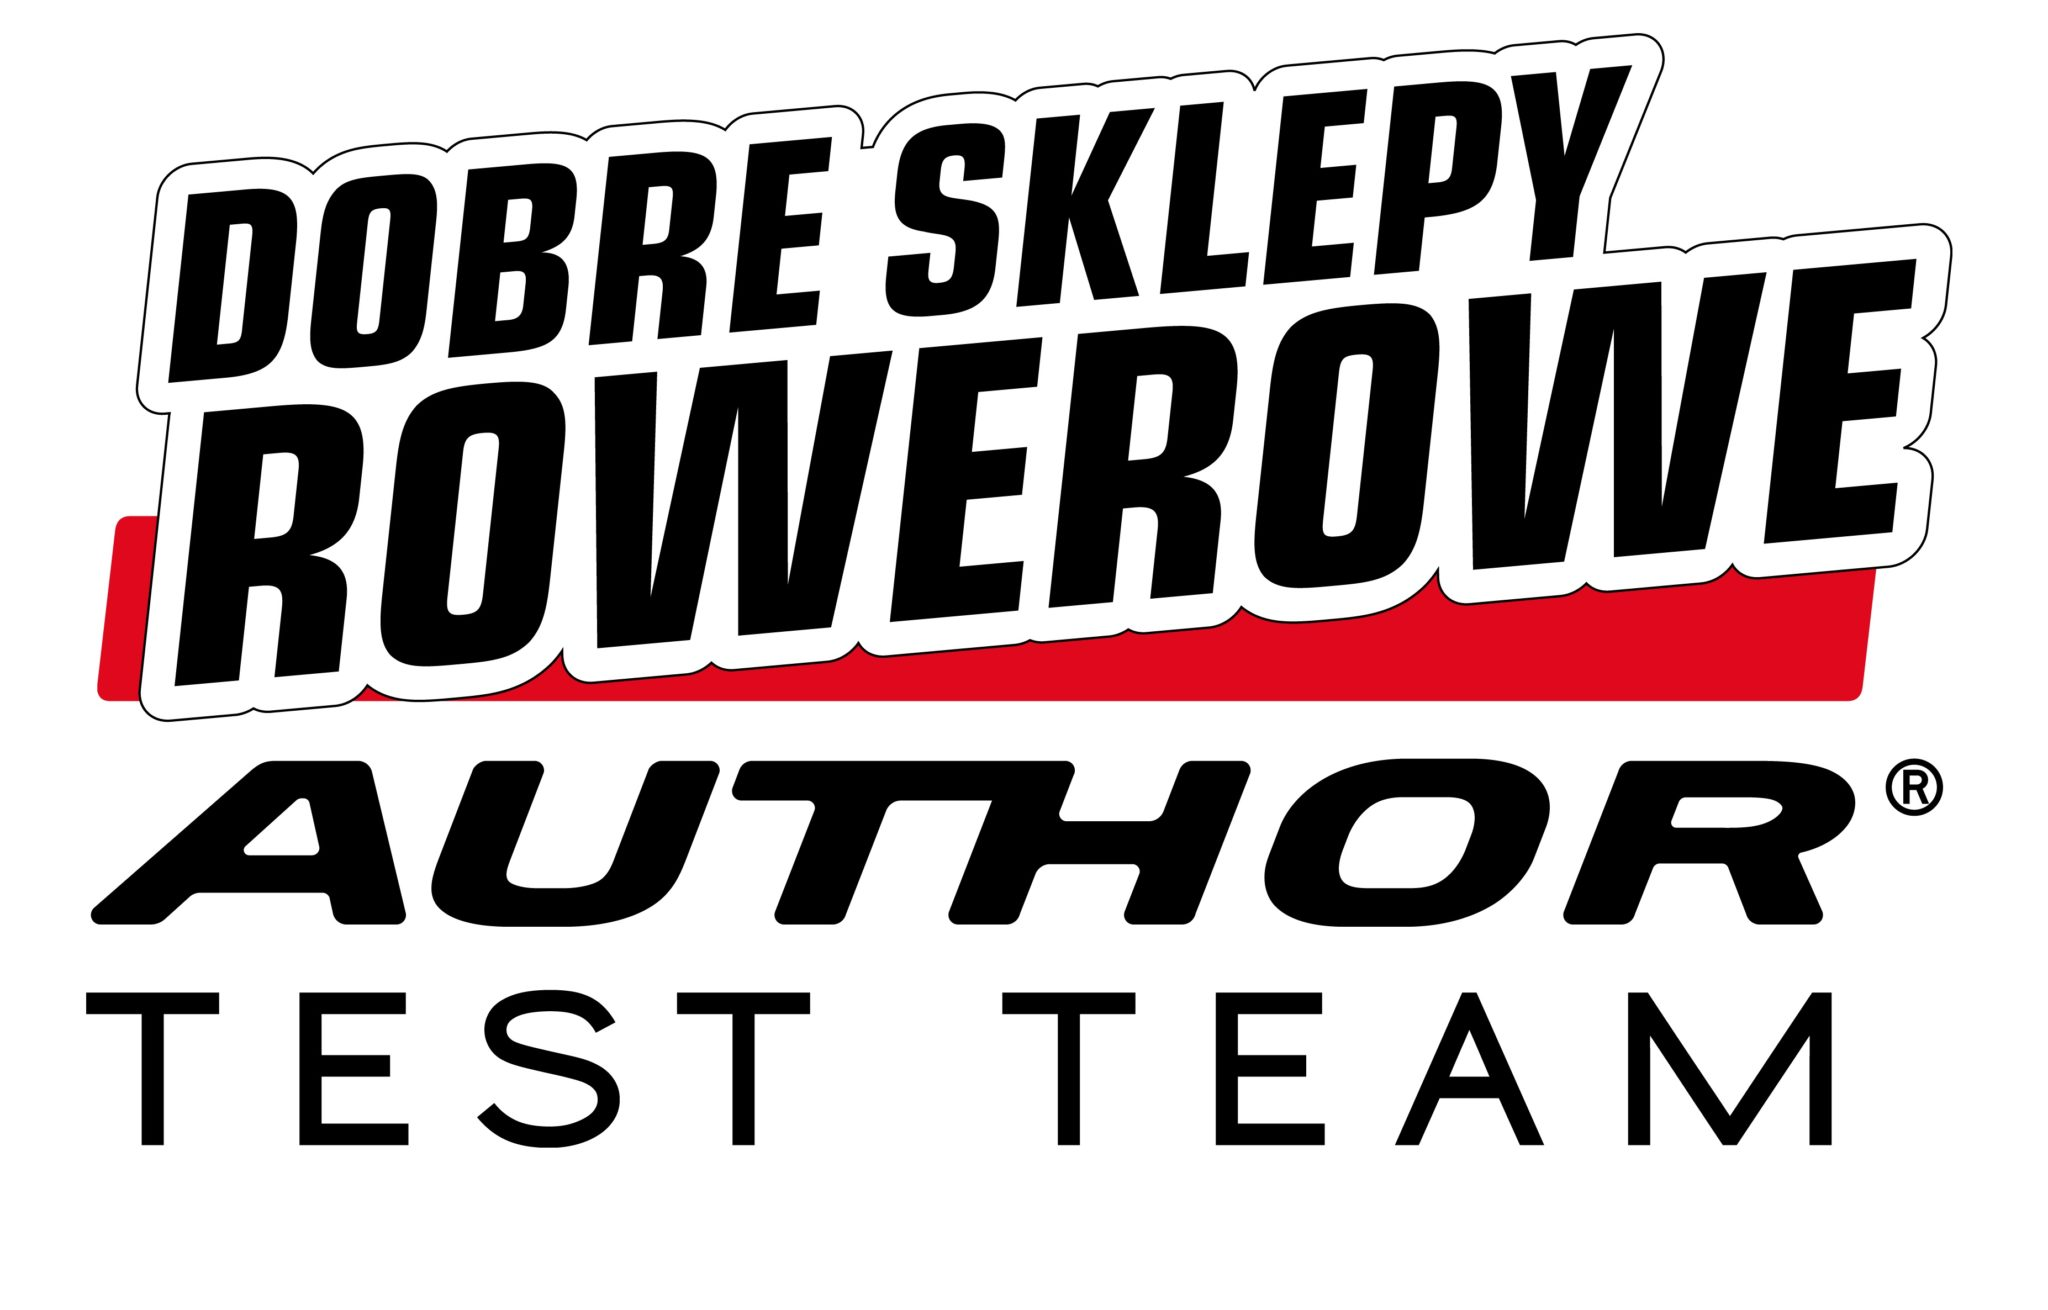 Dobre Sklepy Rowerowe - Author Test Team